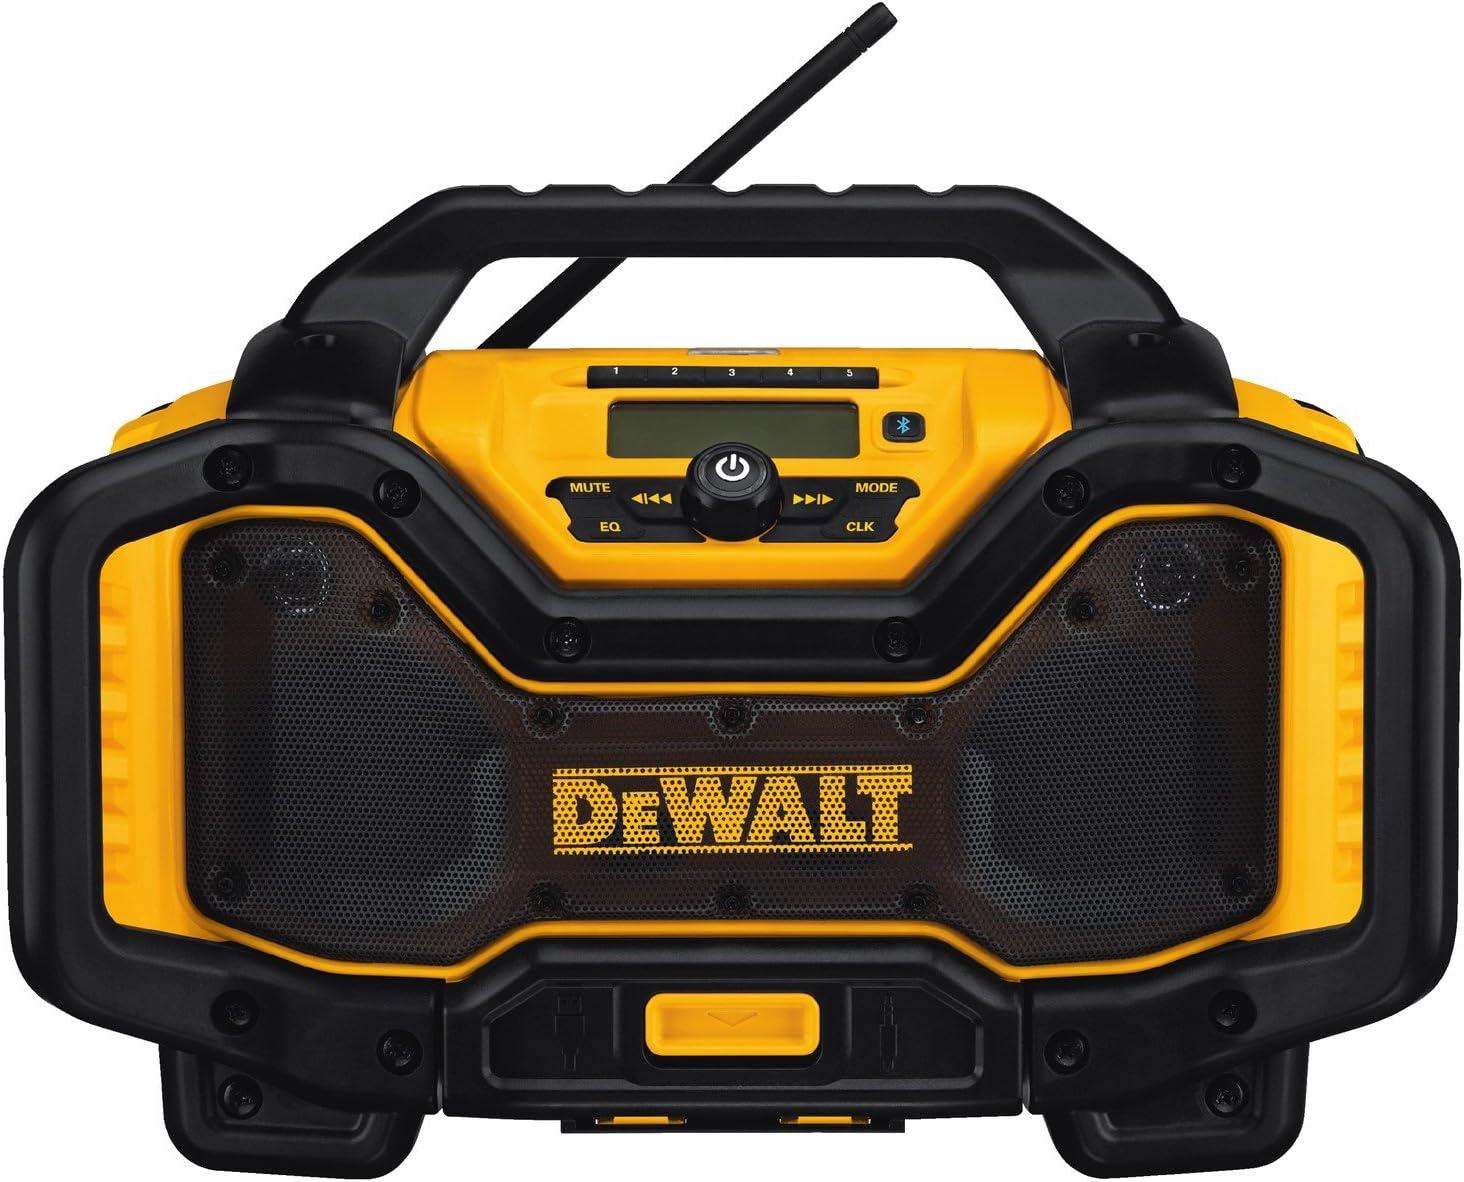 DEWALT 20V MAX Portable Radio & Battery Charger, Bluetooth (DCR025) - -